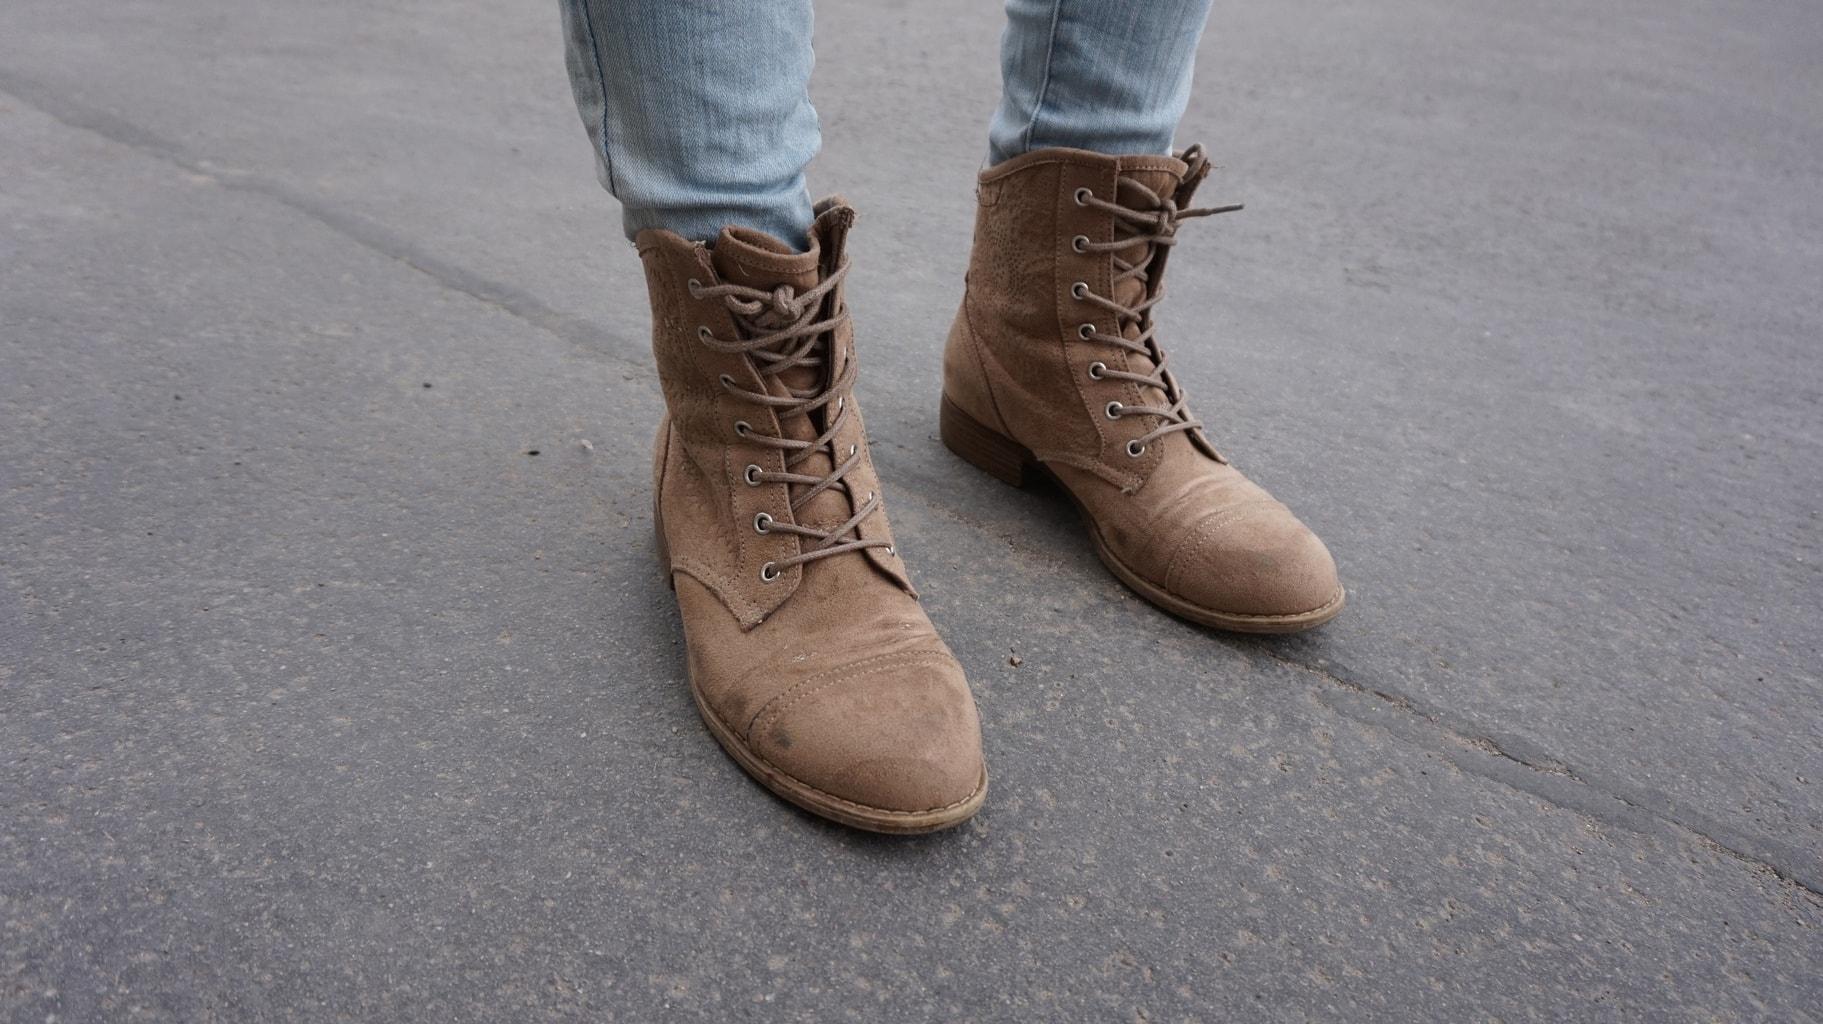 LOC-UV-Isabella-Shoes